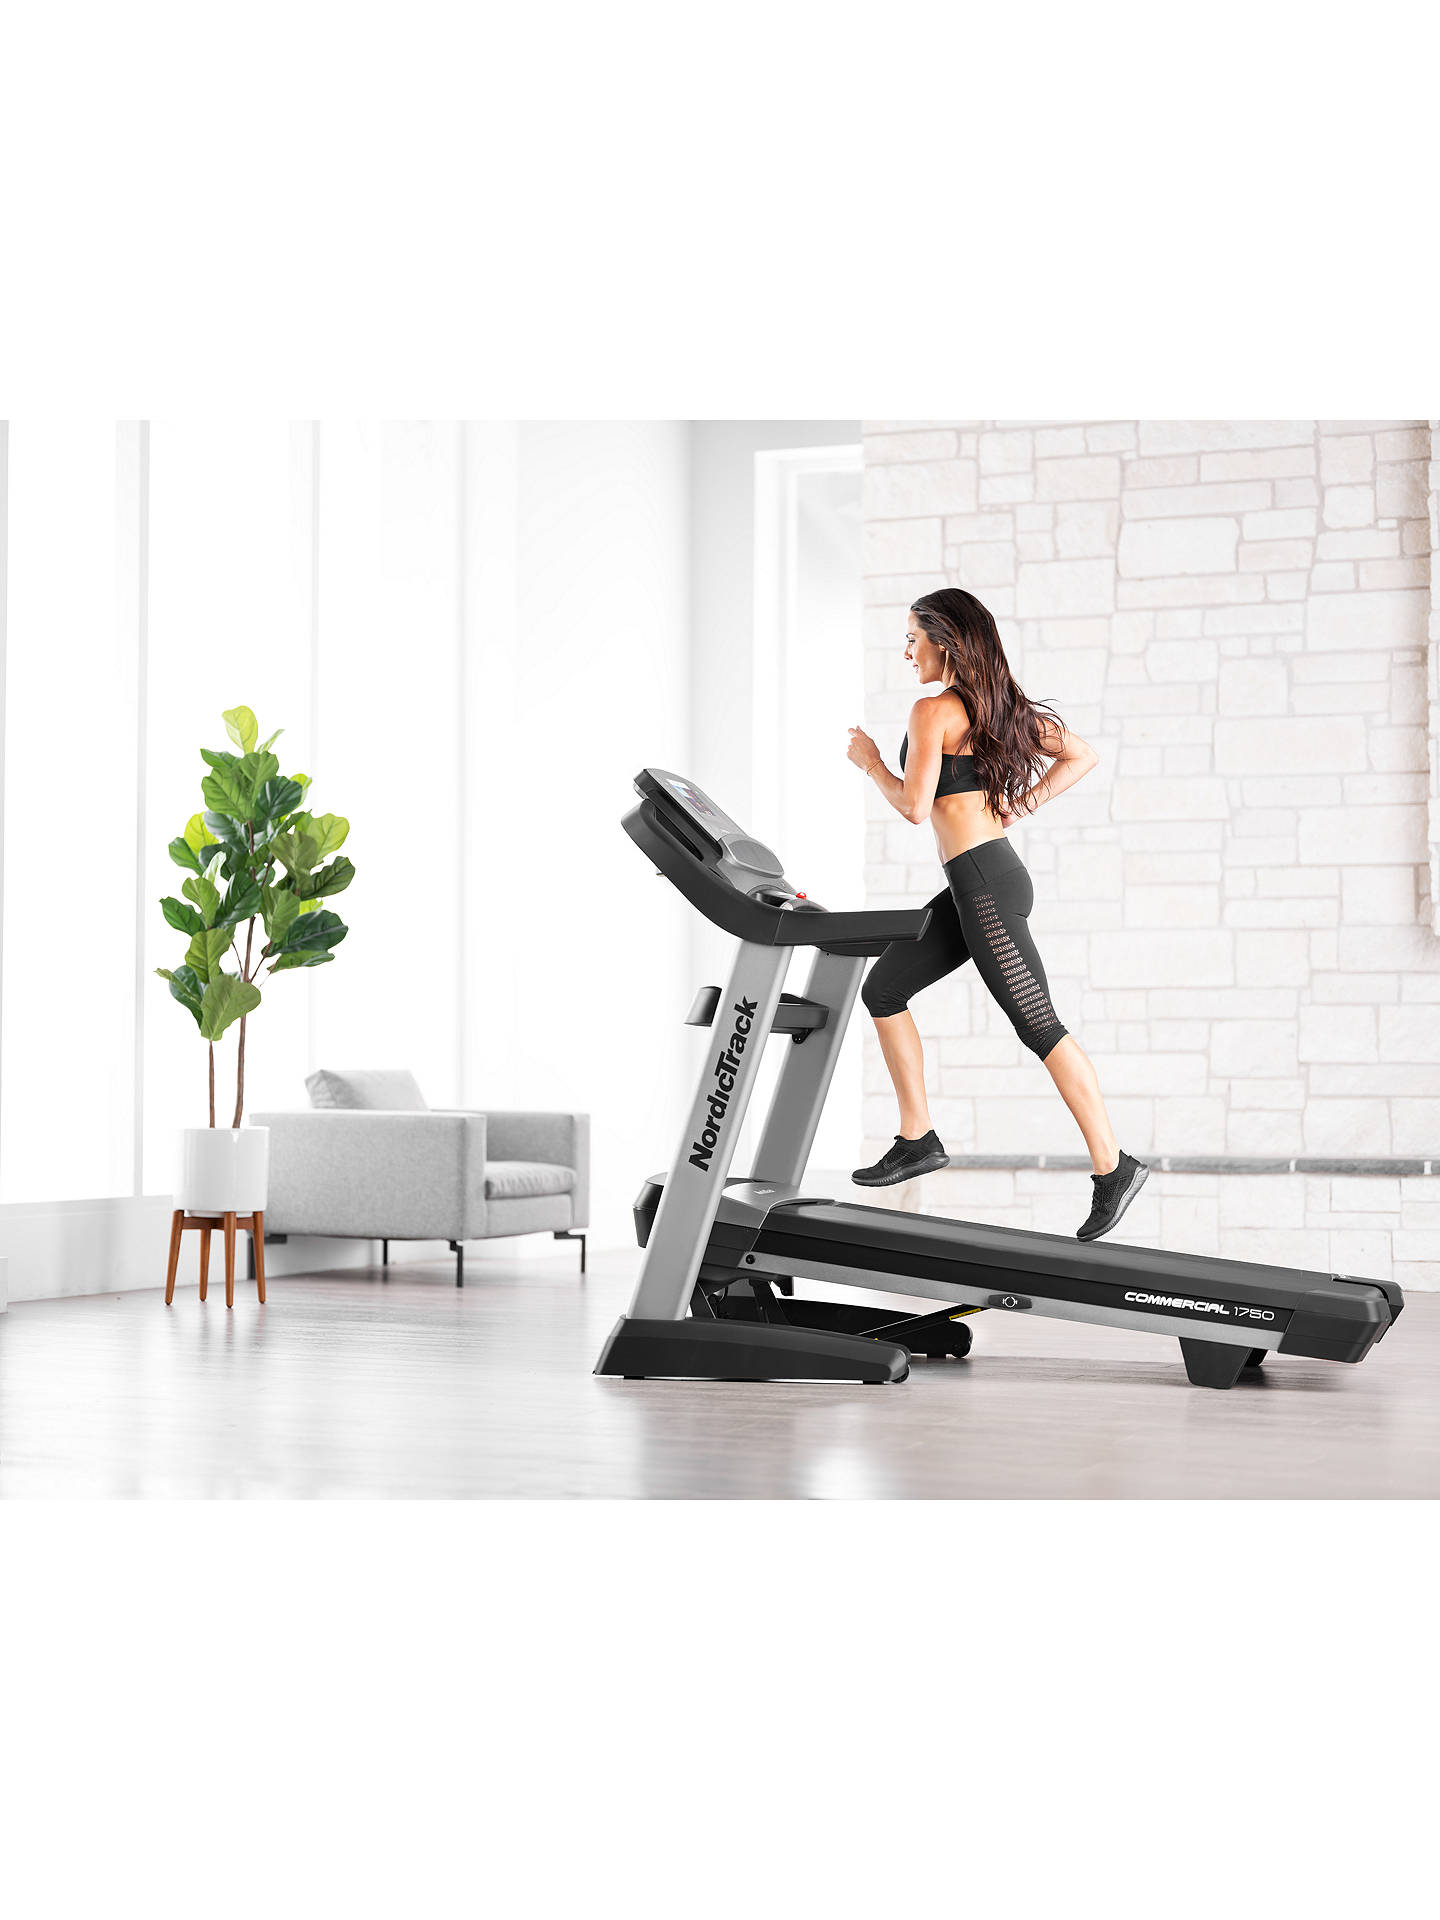 NordicTrack Commercial 1750 Treadmill